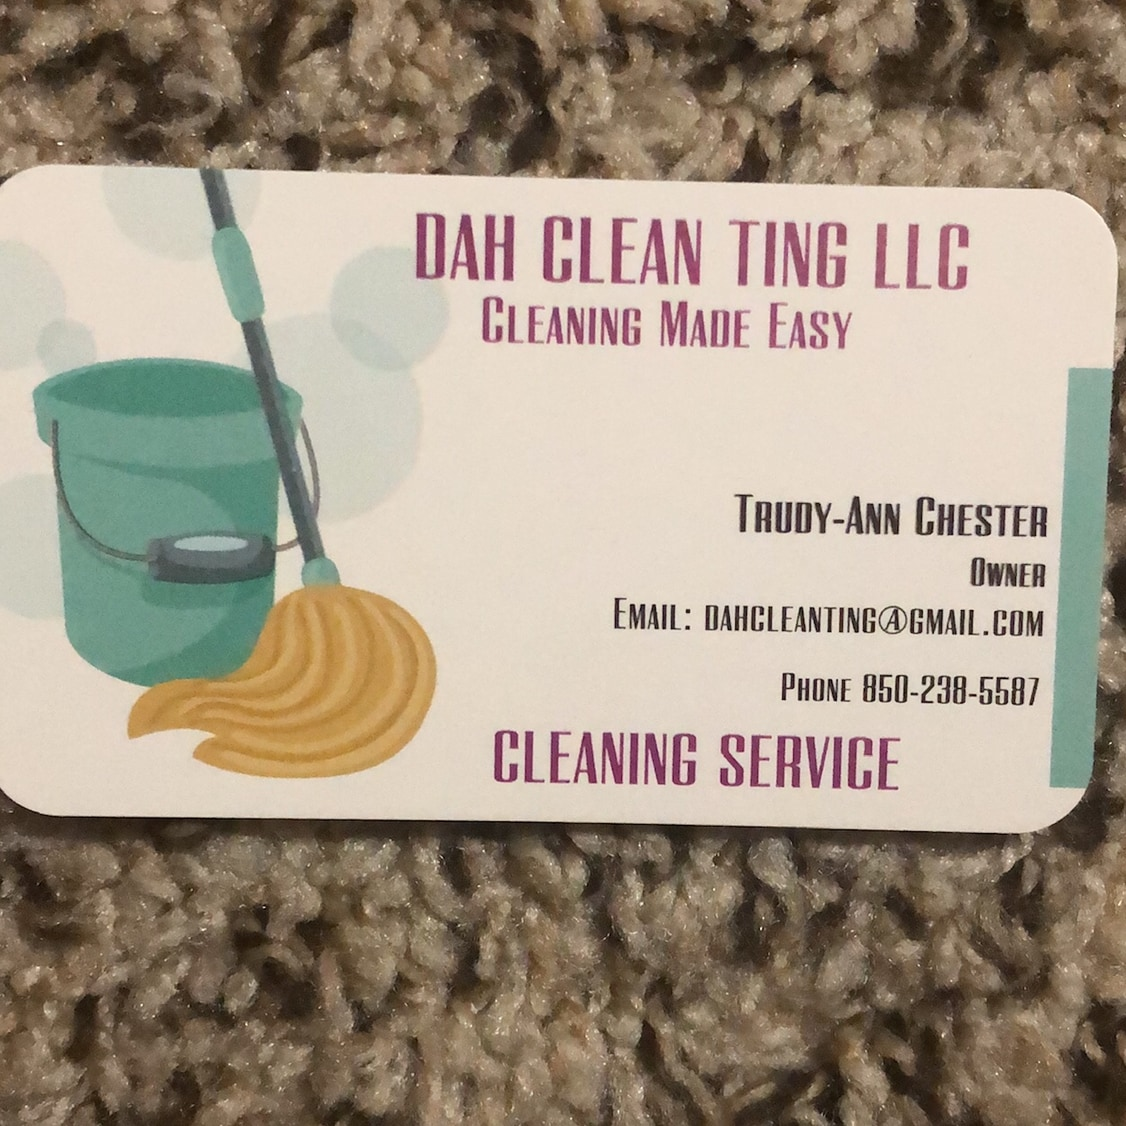 Dah Clean Ting LLC